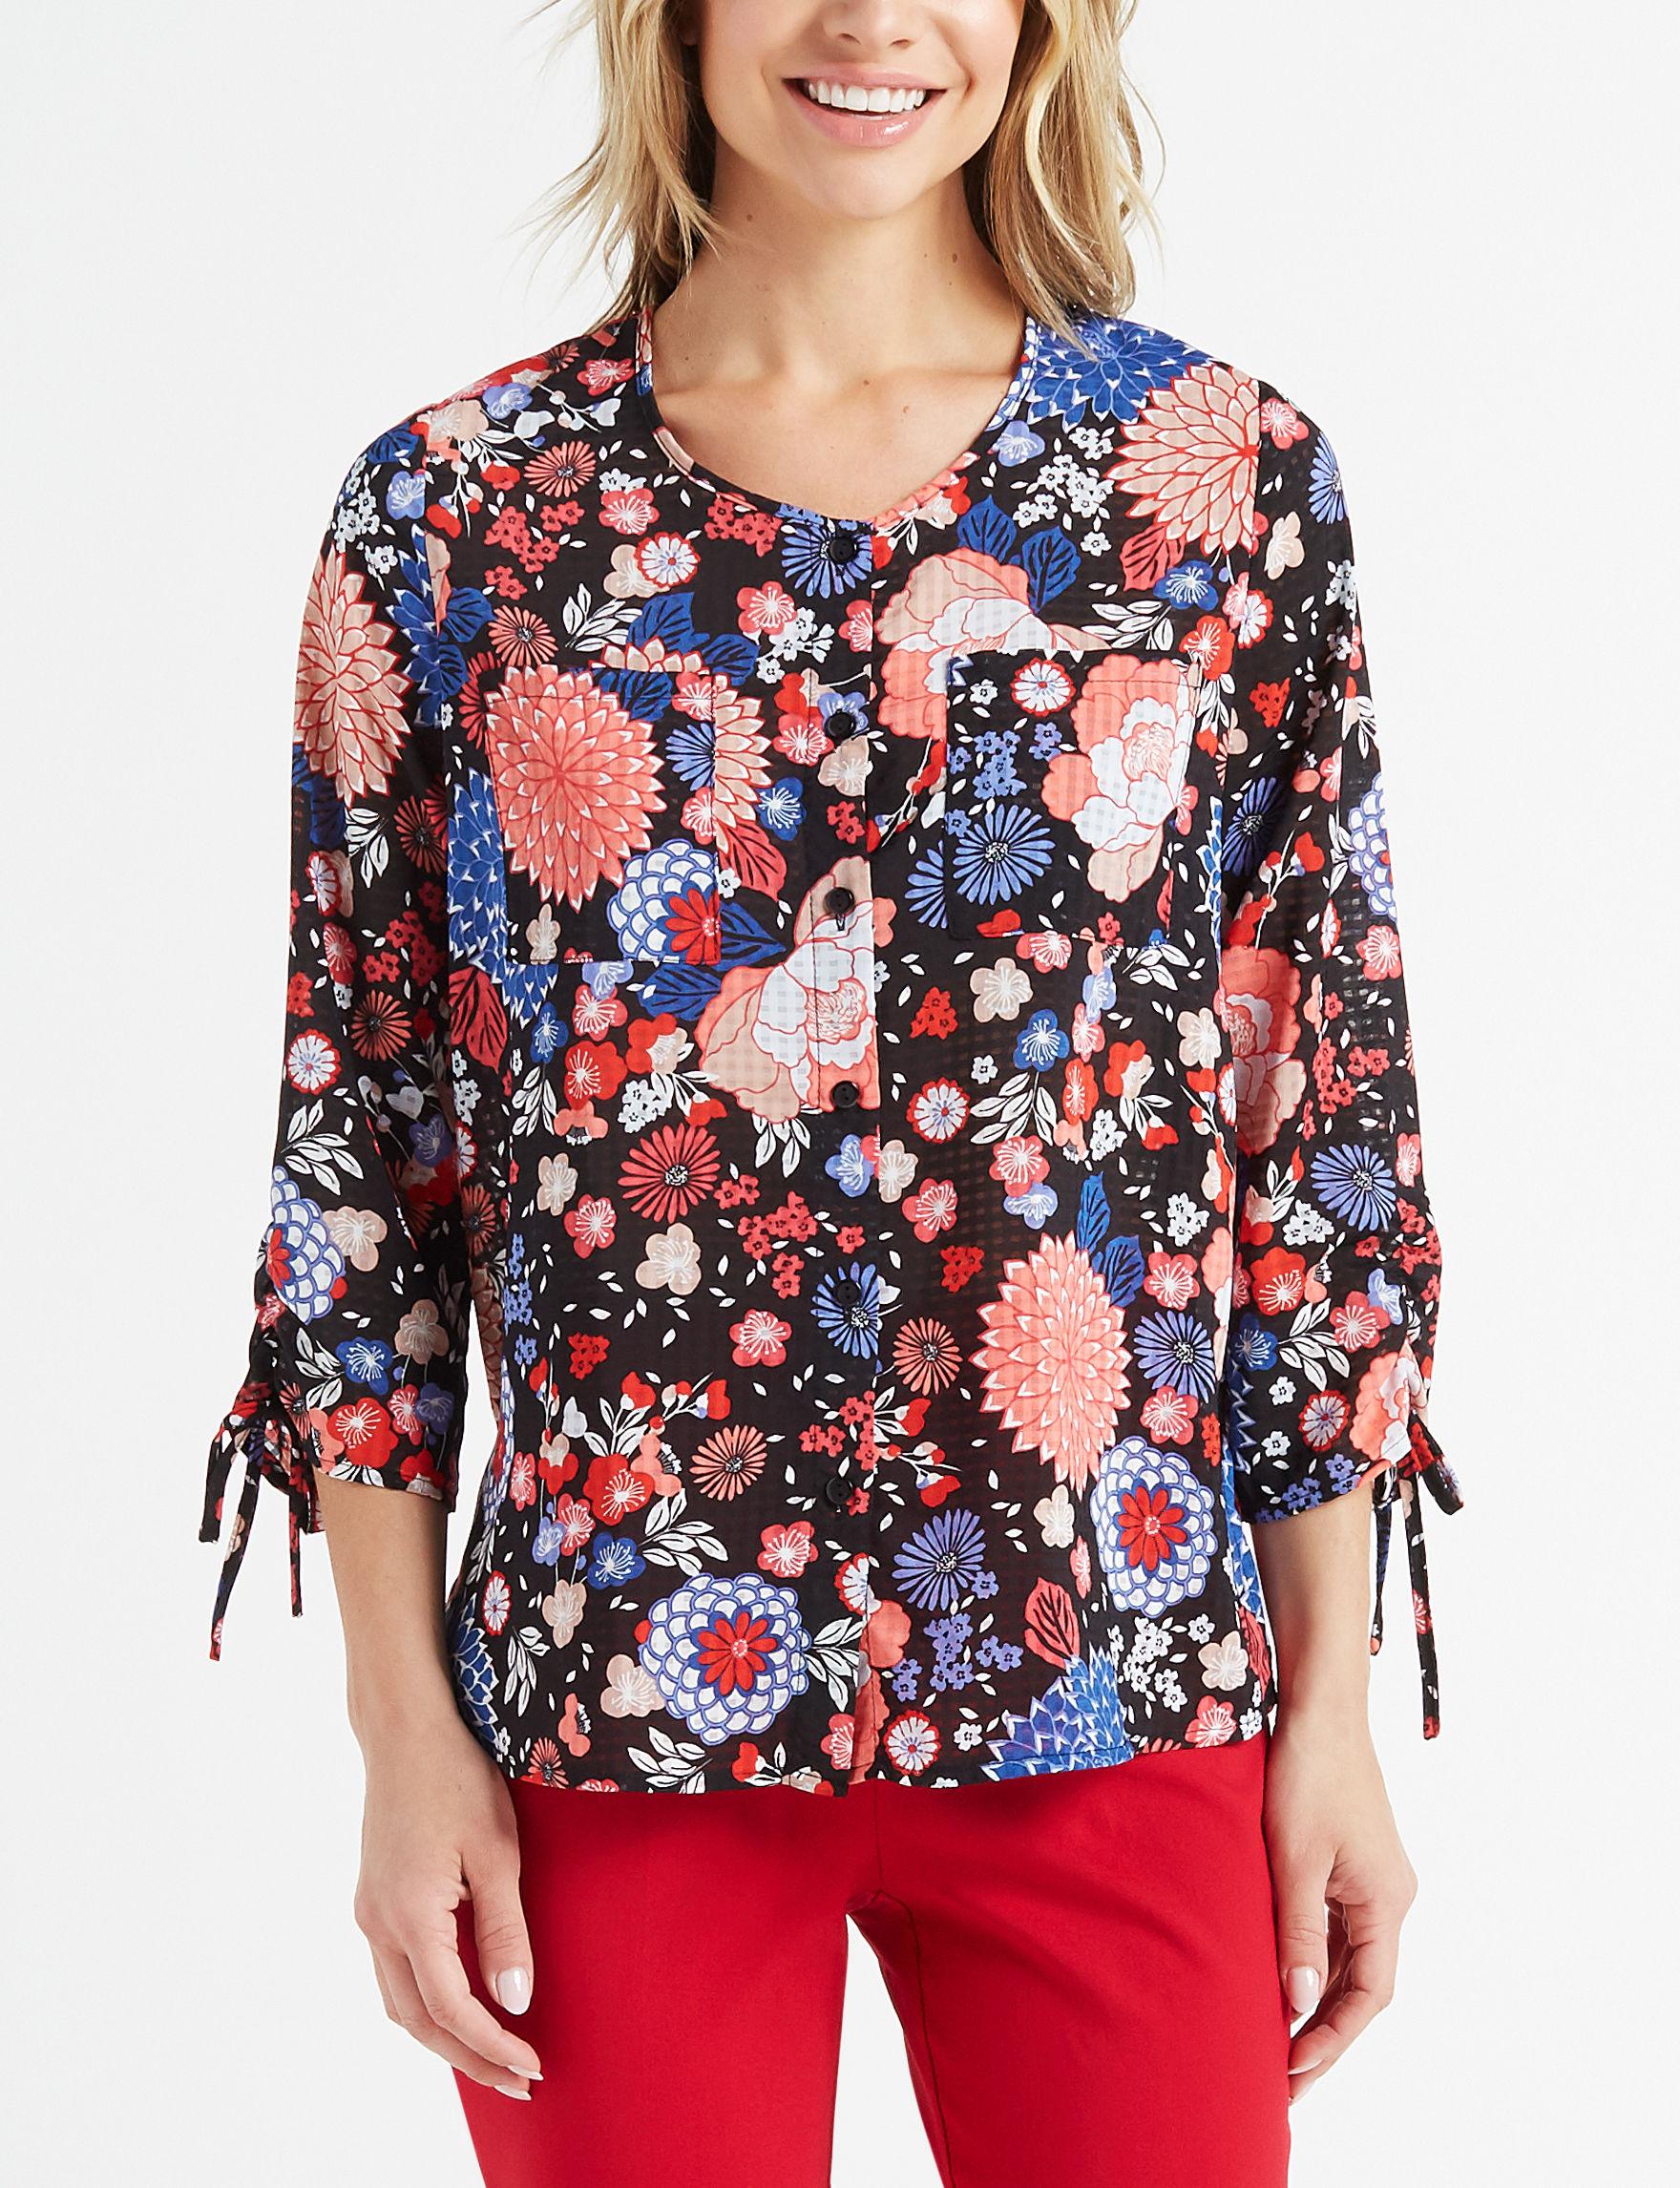 Rebecca Malone Black Floral Shirts & Blouses